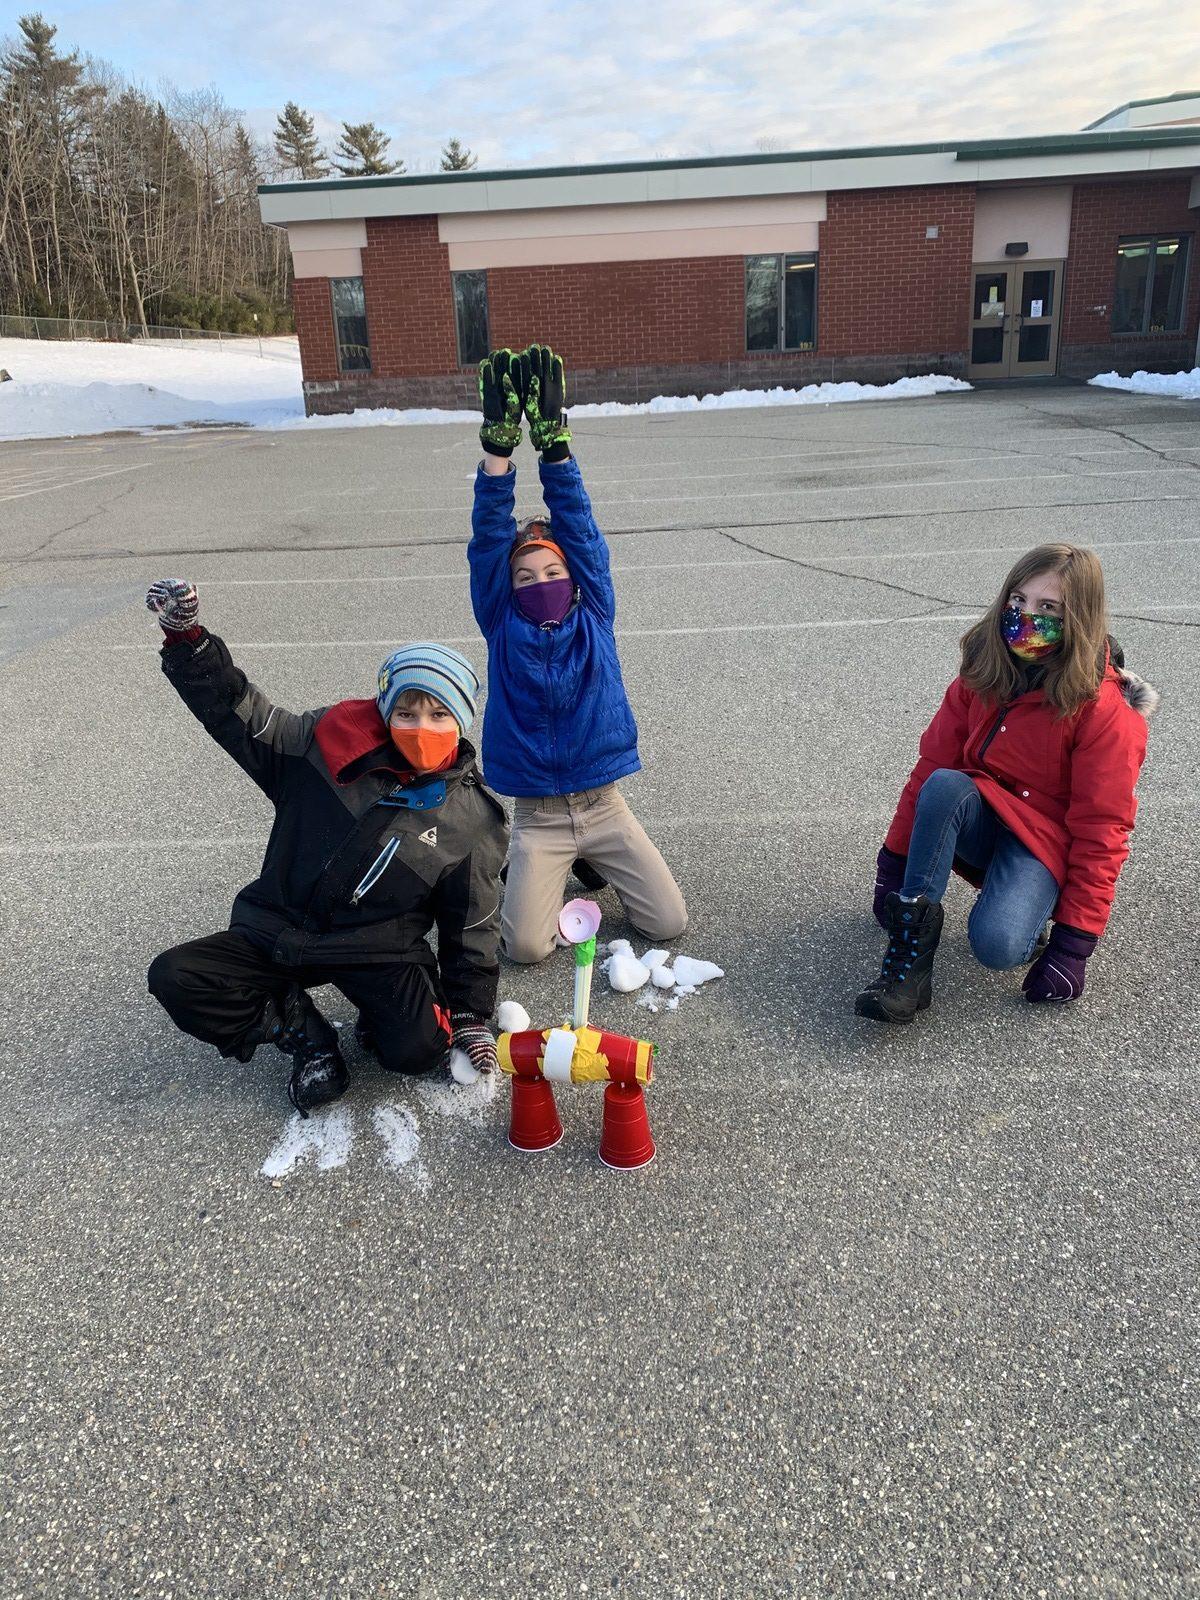 Annual WinterKids Winter Games begins this month